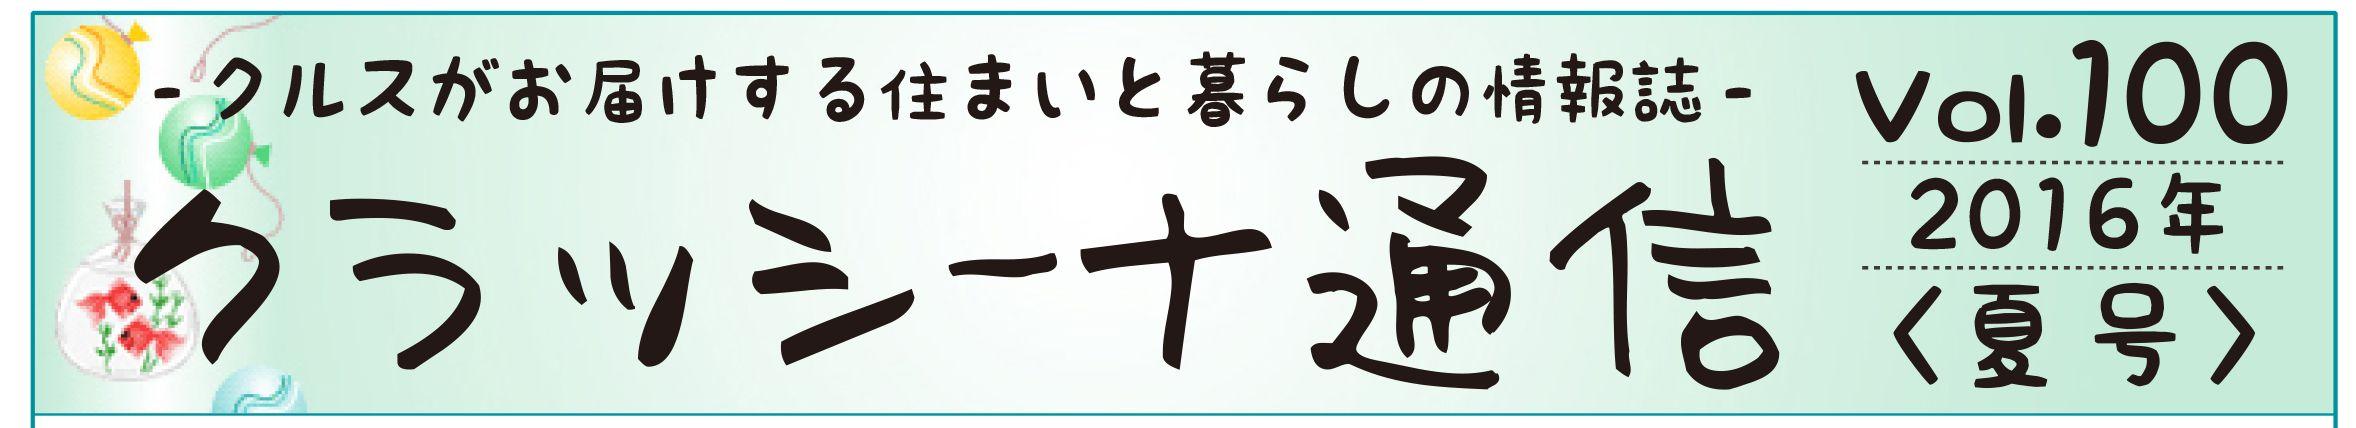 KuraSi-natu-sin100-01.jpg